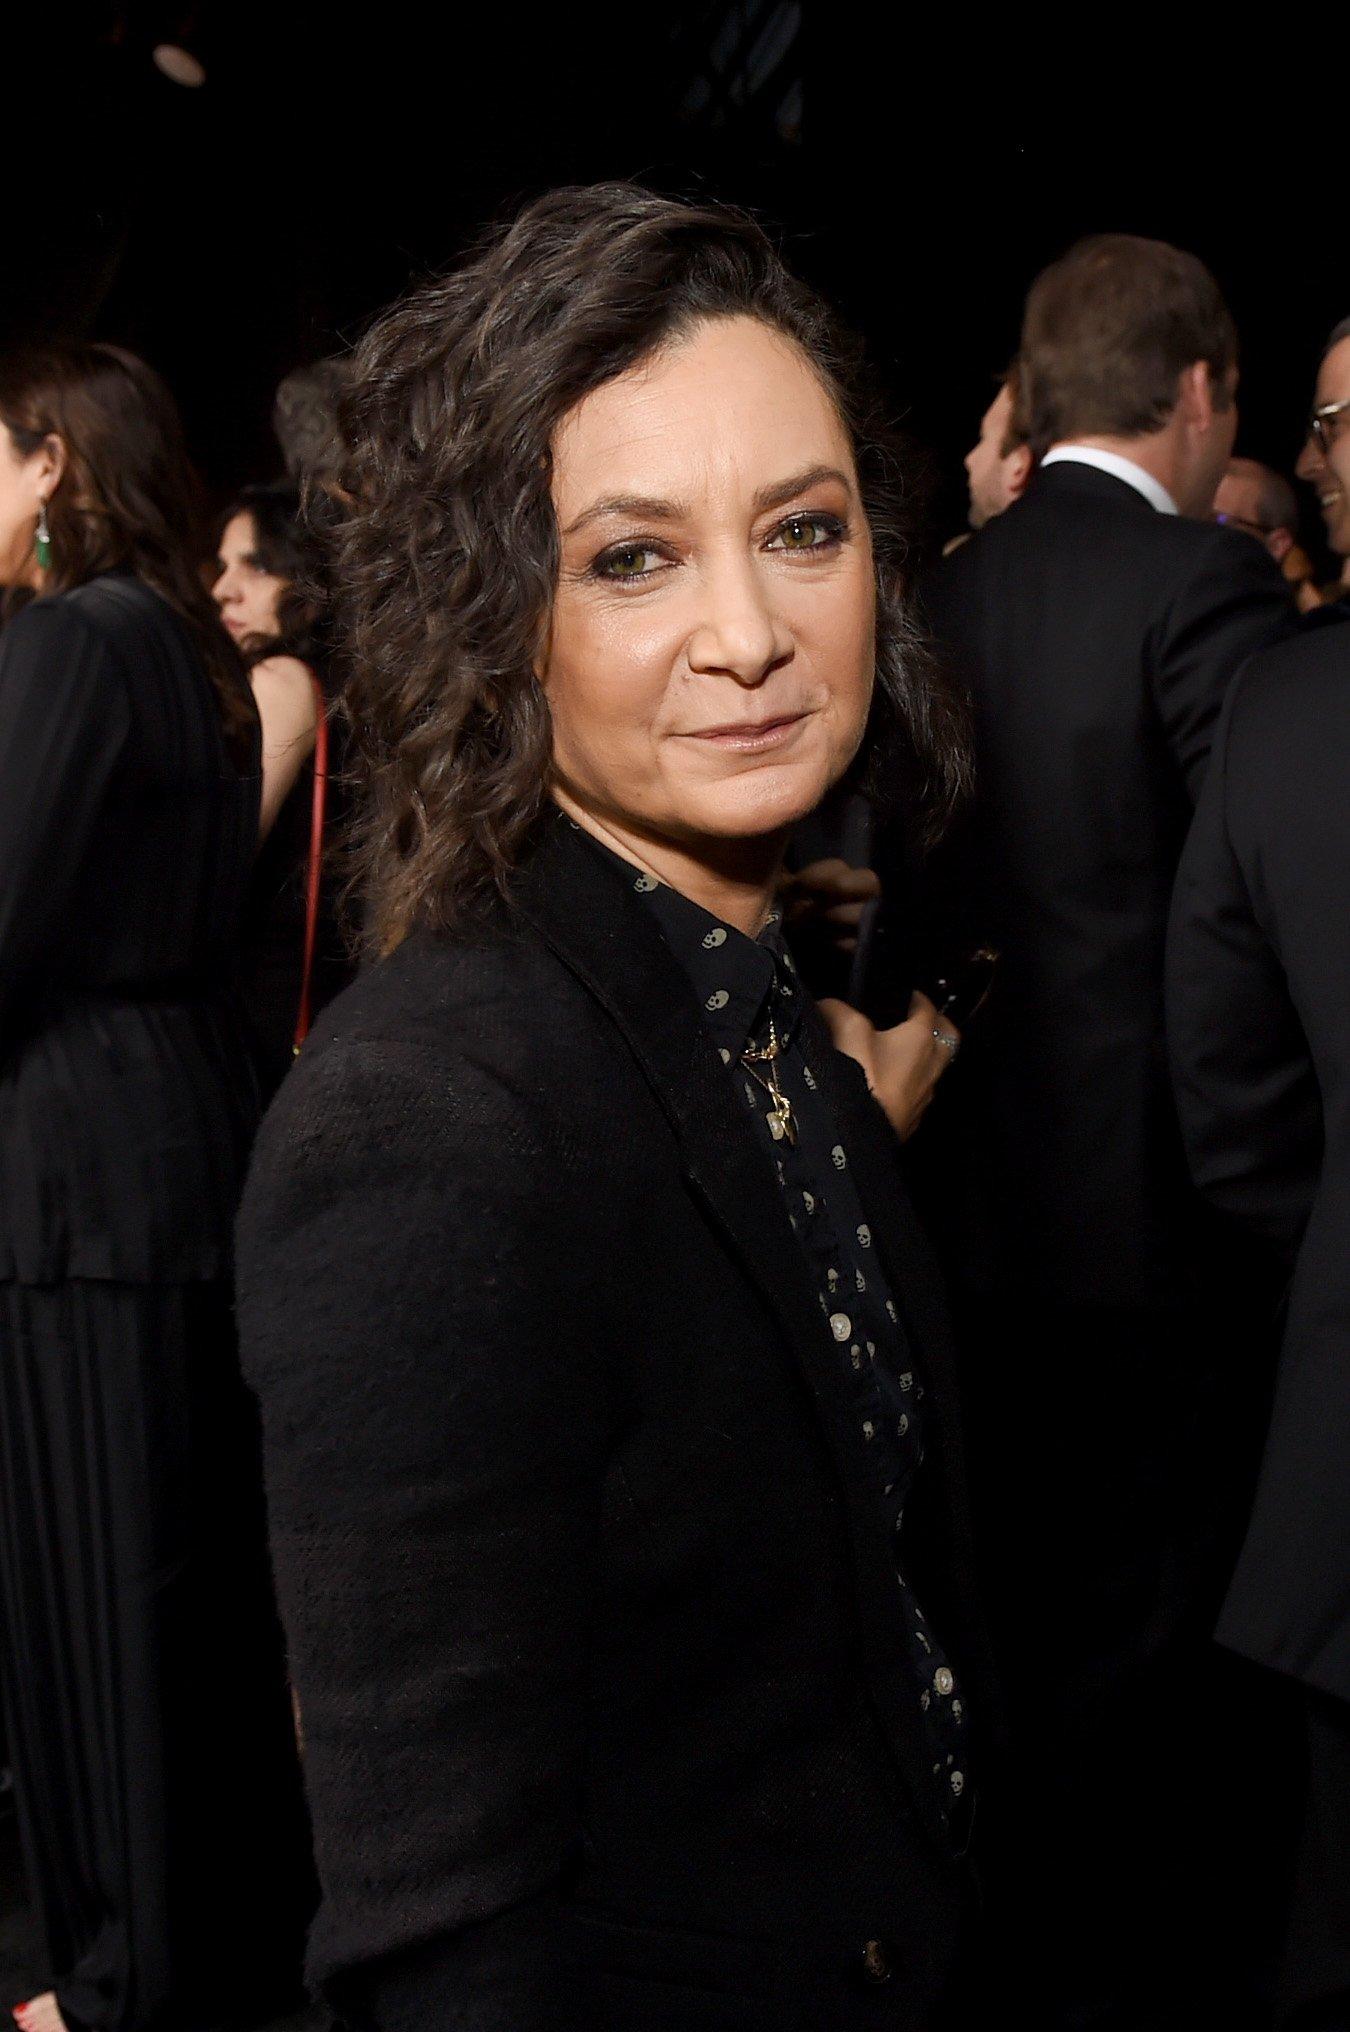 Sara Gilbert at the 24th annual Critics' Choice Awards in Santa Monica, California | Photo: Getty Images